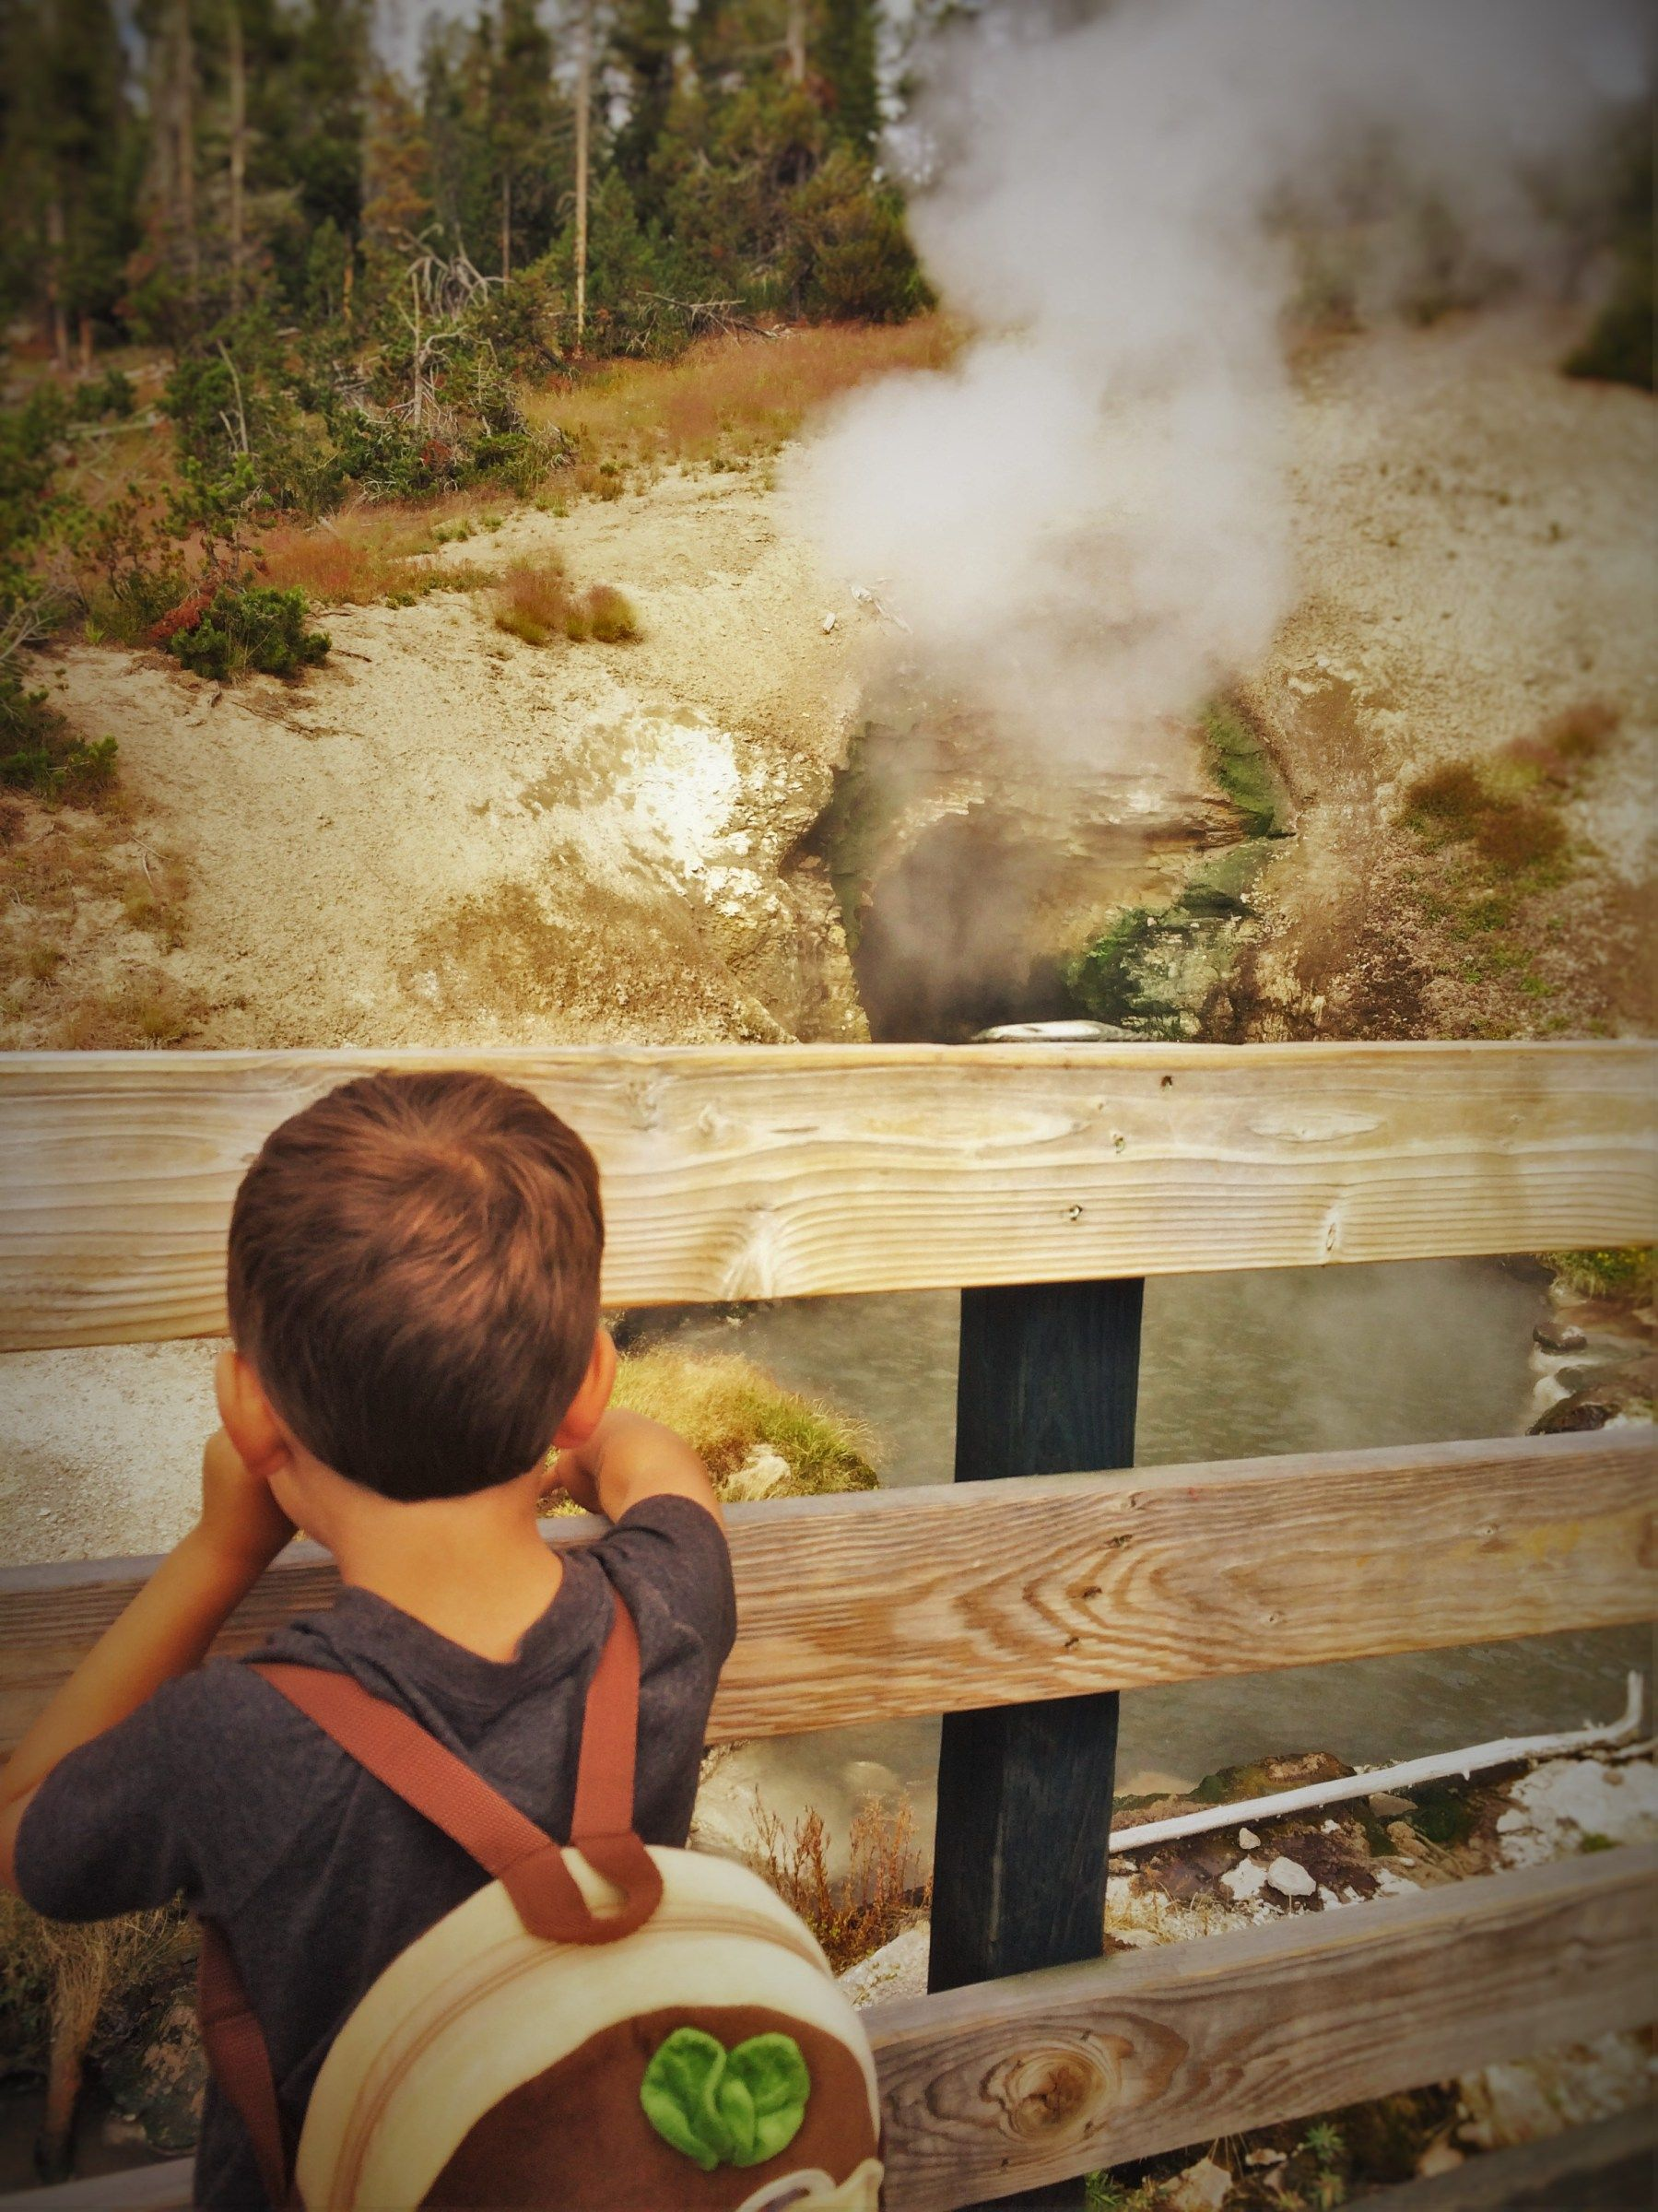 LittleMan at Dragons Cauldron Mud Volcano Yellowstone 2